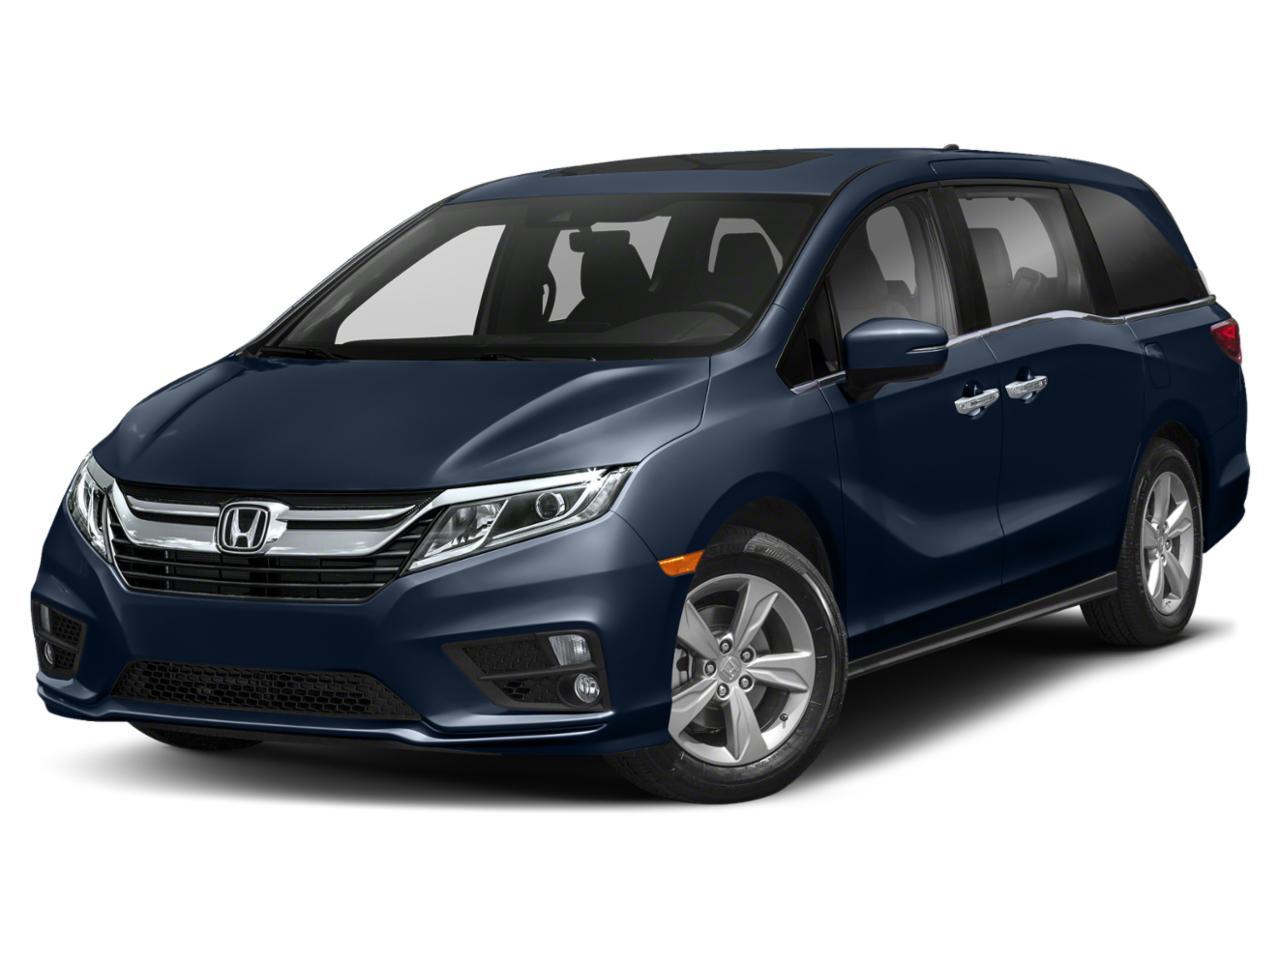 2019 Honda Odyssey Vehicle Photo in Owensboro, KY 42303